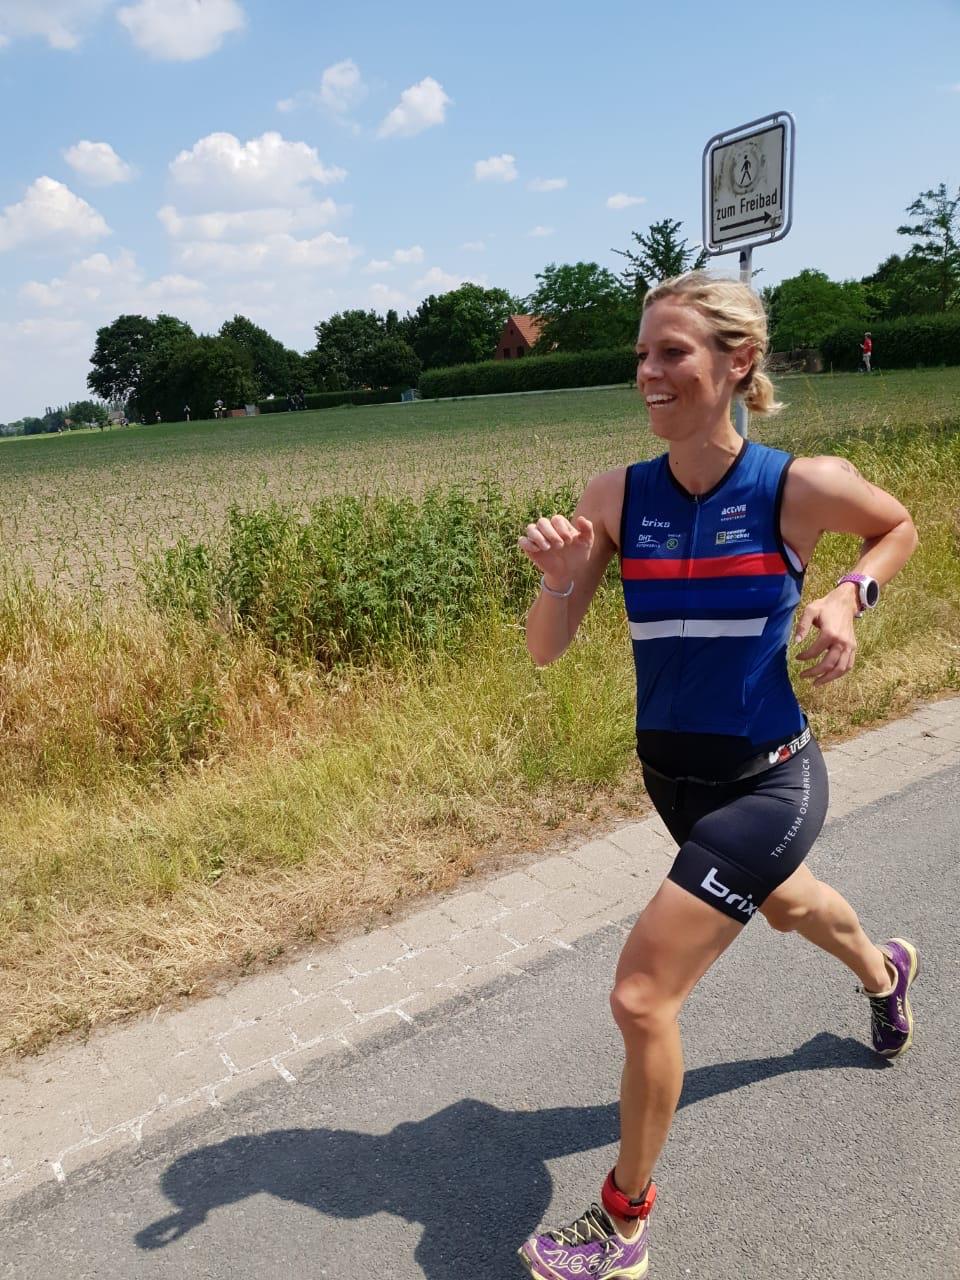 Simone Terheggen